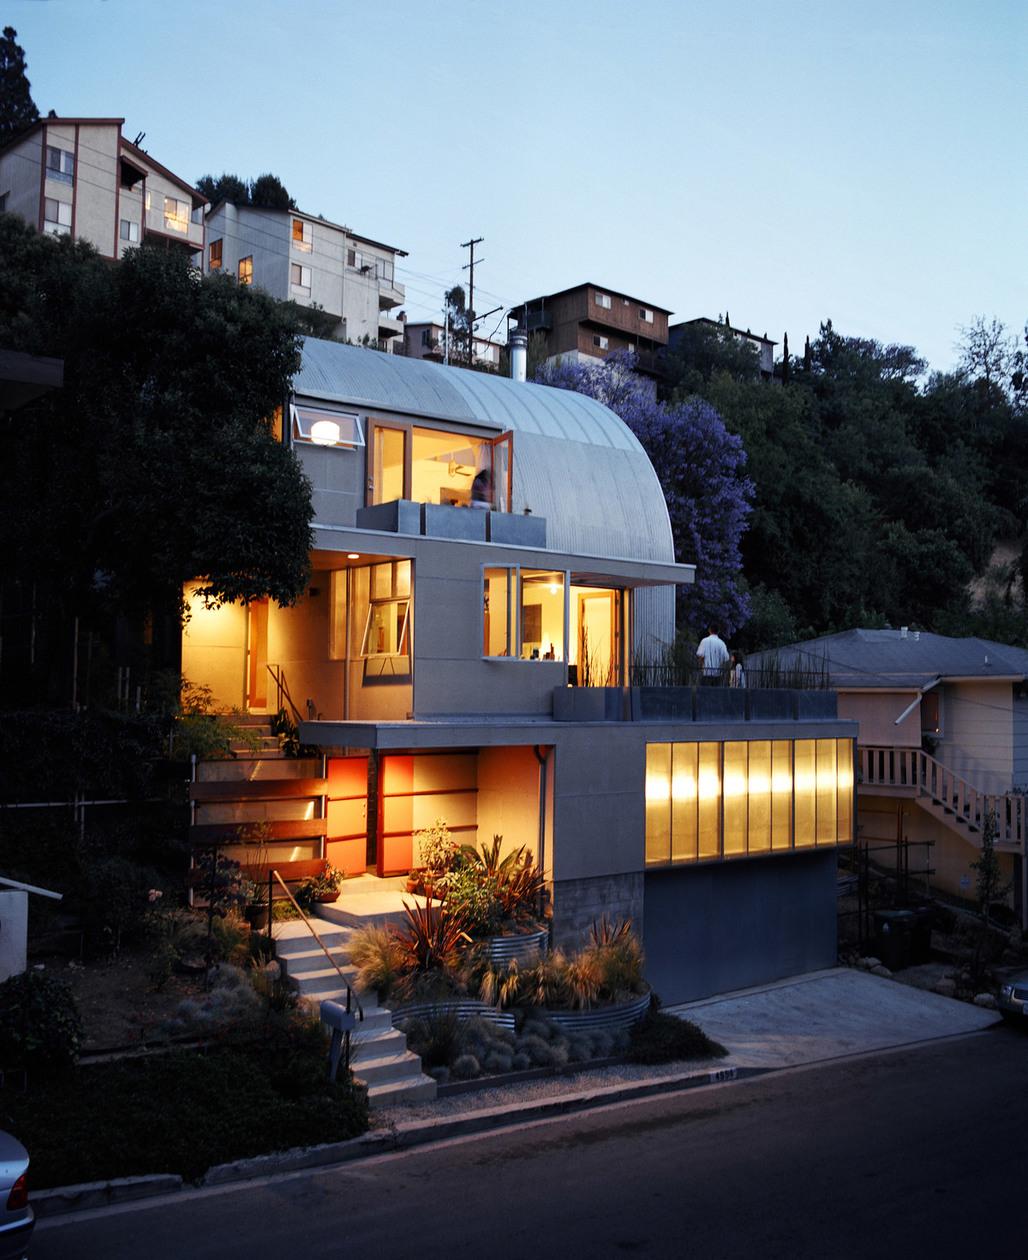 Fung + Blatt Residence in Los Angeles, CA by Fung + Blatt Architects